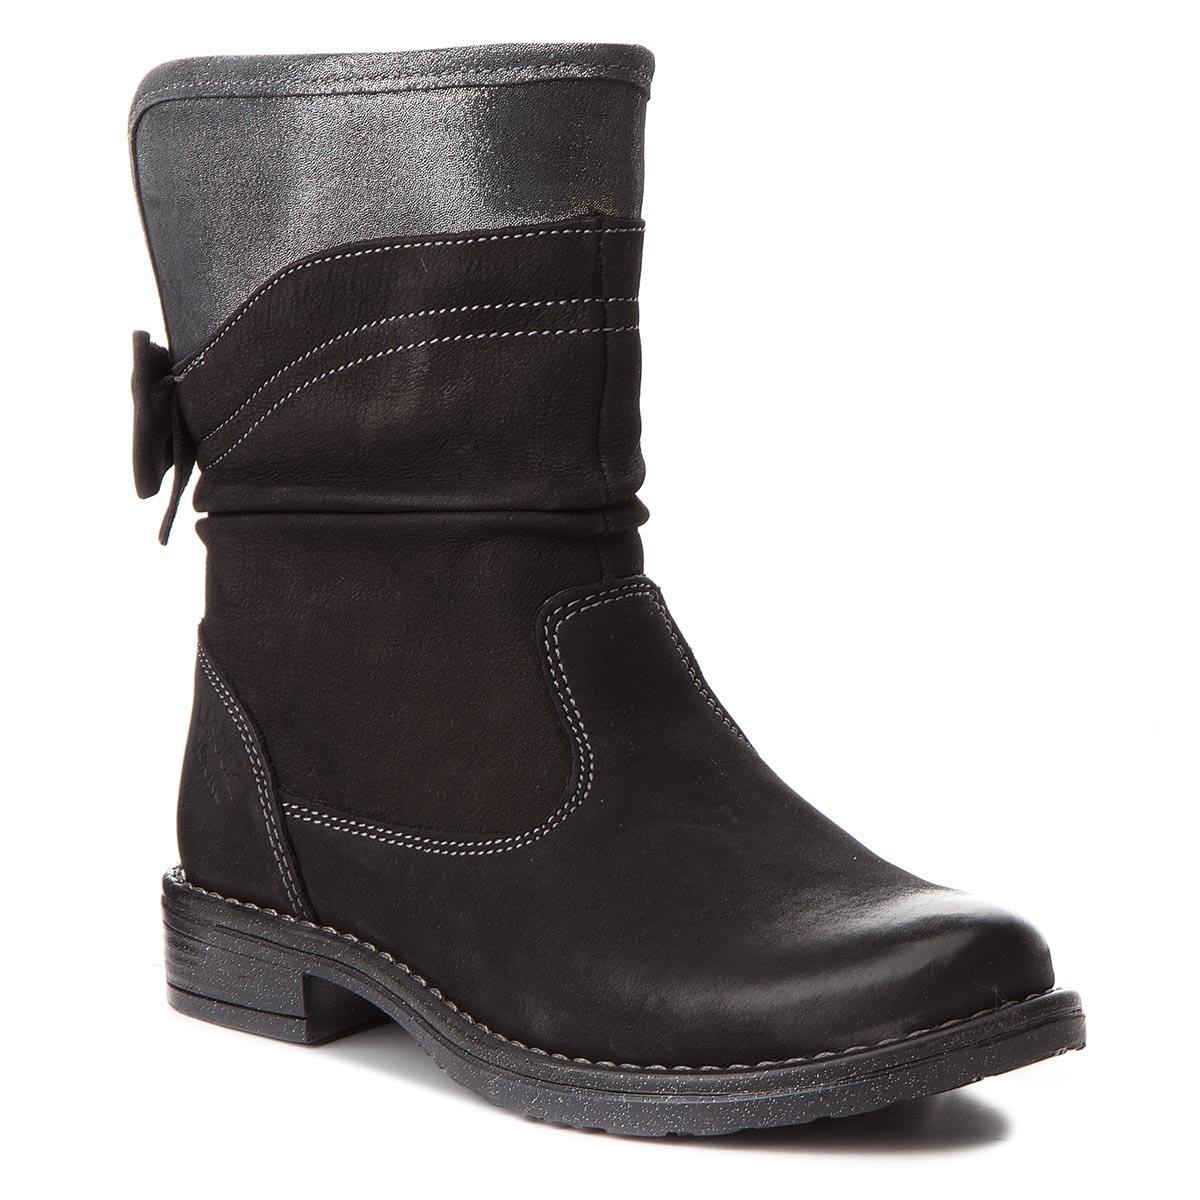 Csizma Lasocki Young CI12-HAGA-37 Fekete Fekete Női - Márkák - https   ccc .eu 0dc16080e9